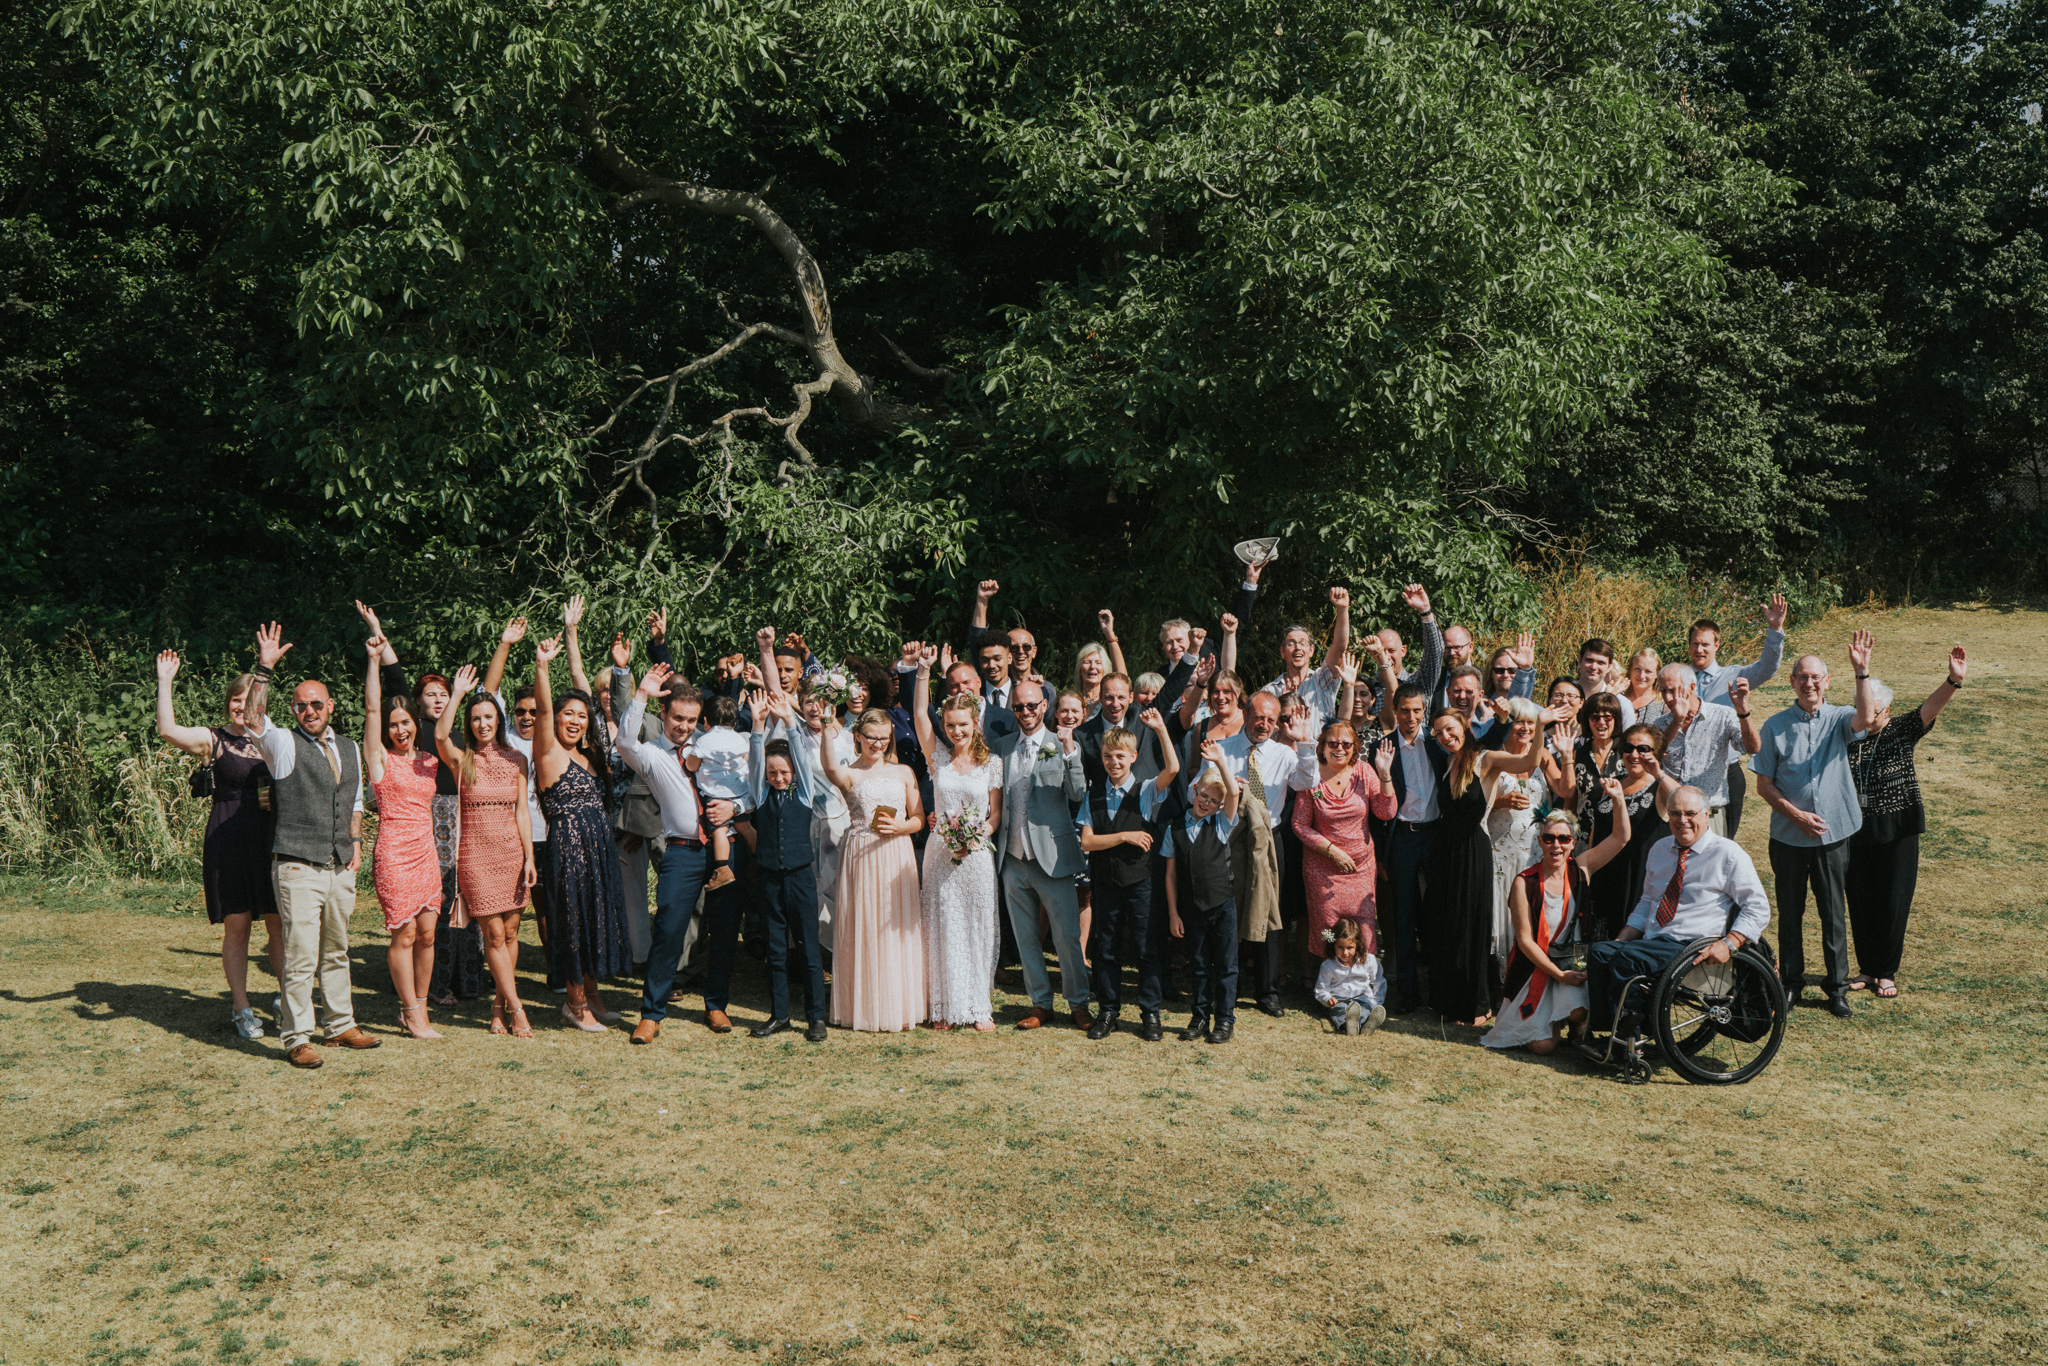 Georgie-Ketu-Firstsite-Wedding-Colchester-Essex-Grace-Elizabeth-Alternative-Wedding-Photographer (15 of 20).jpg